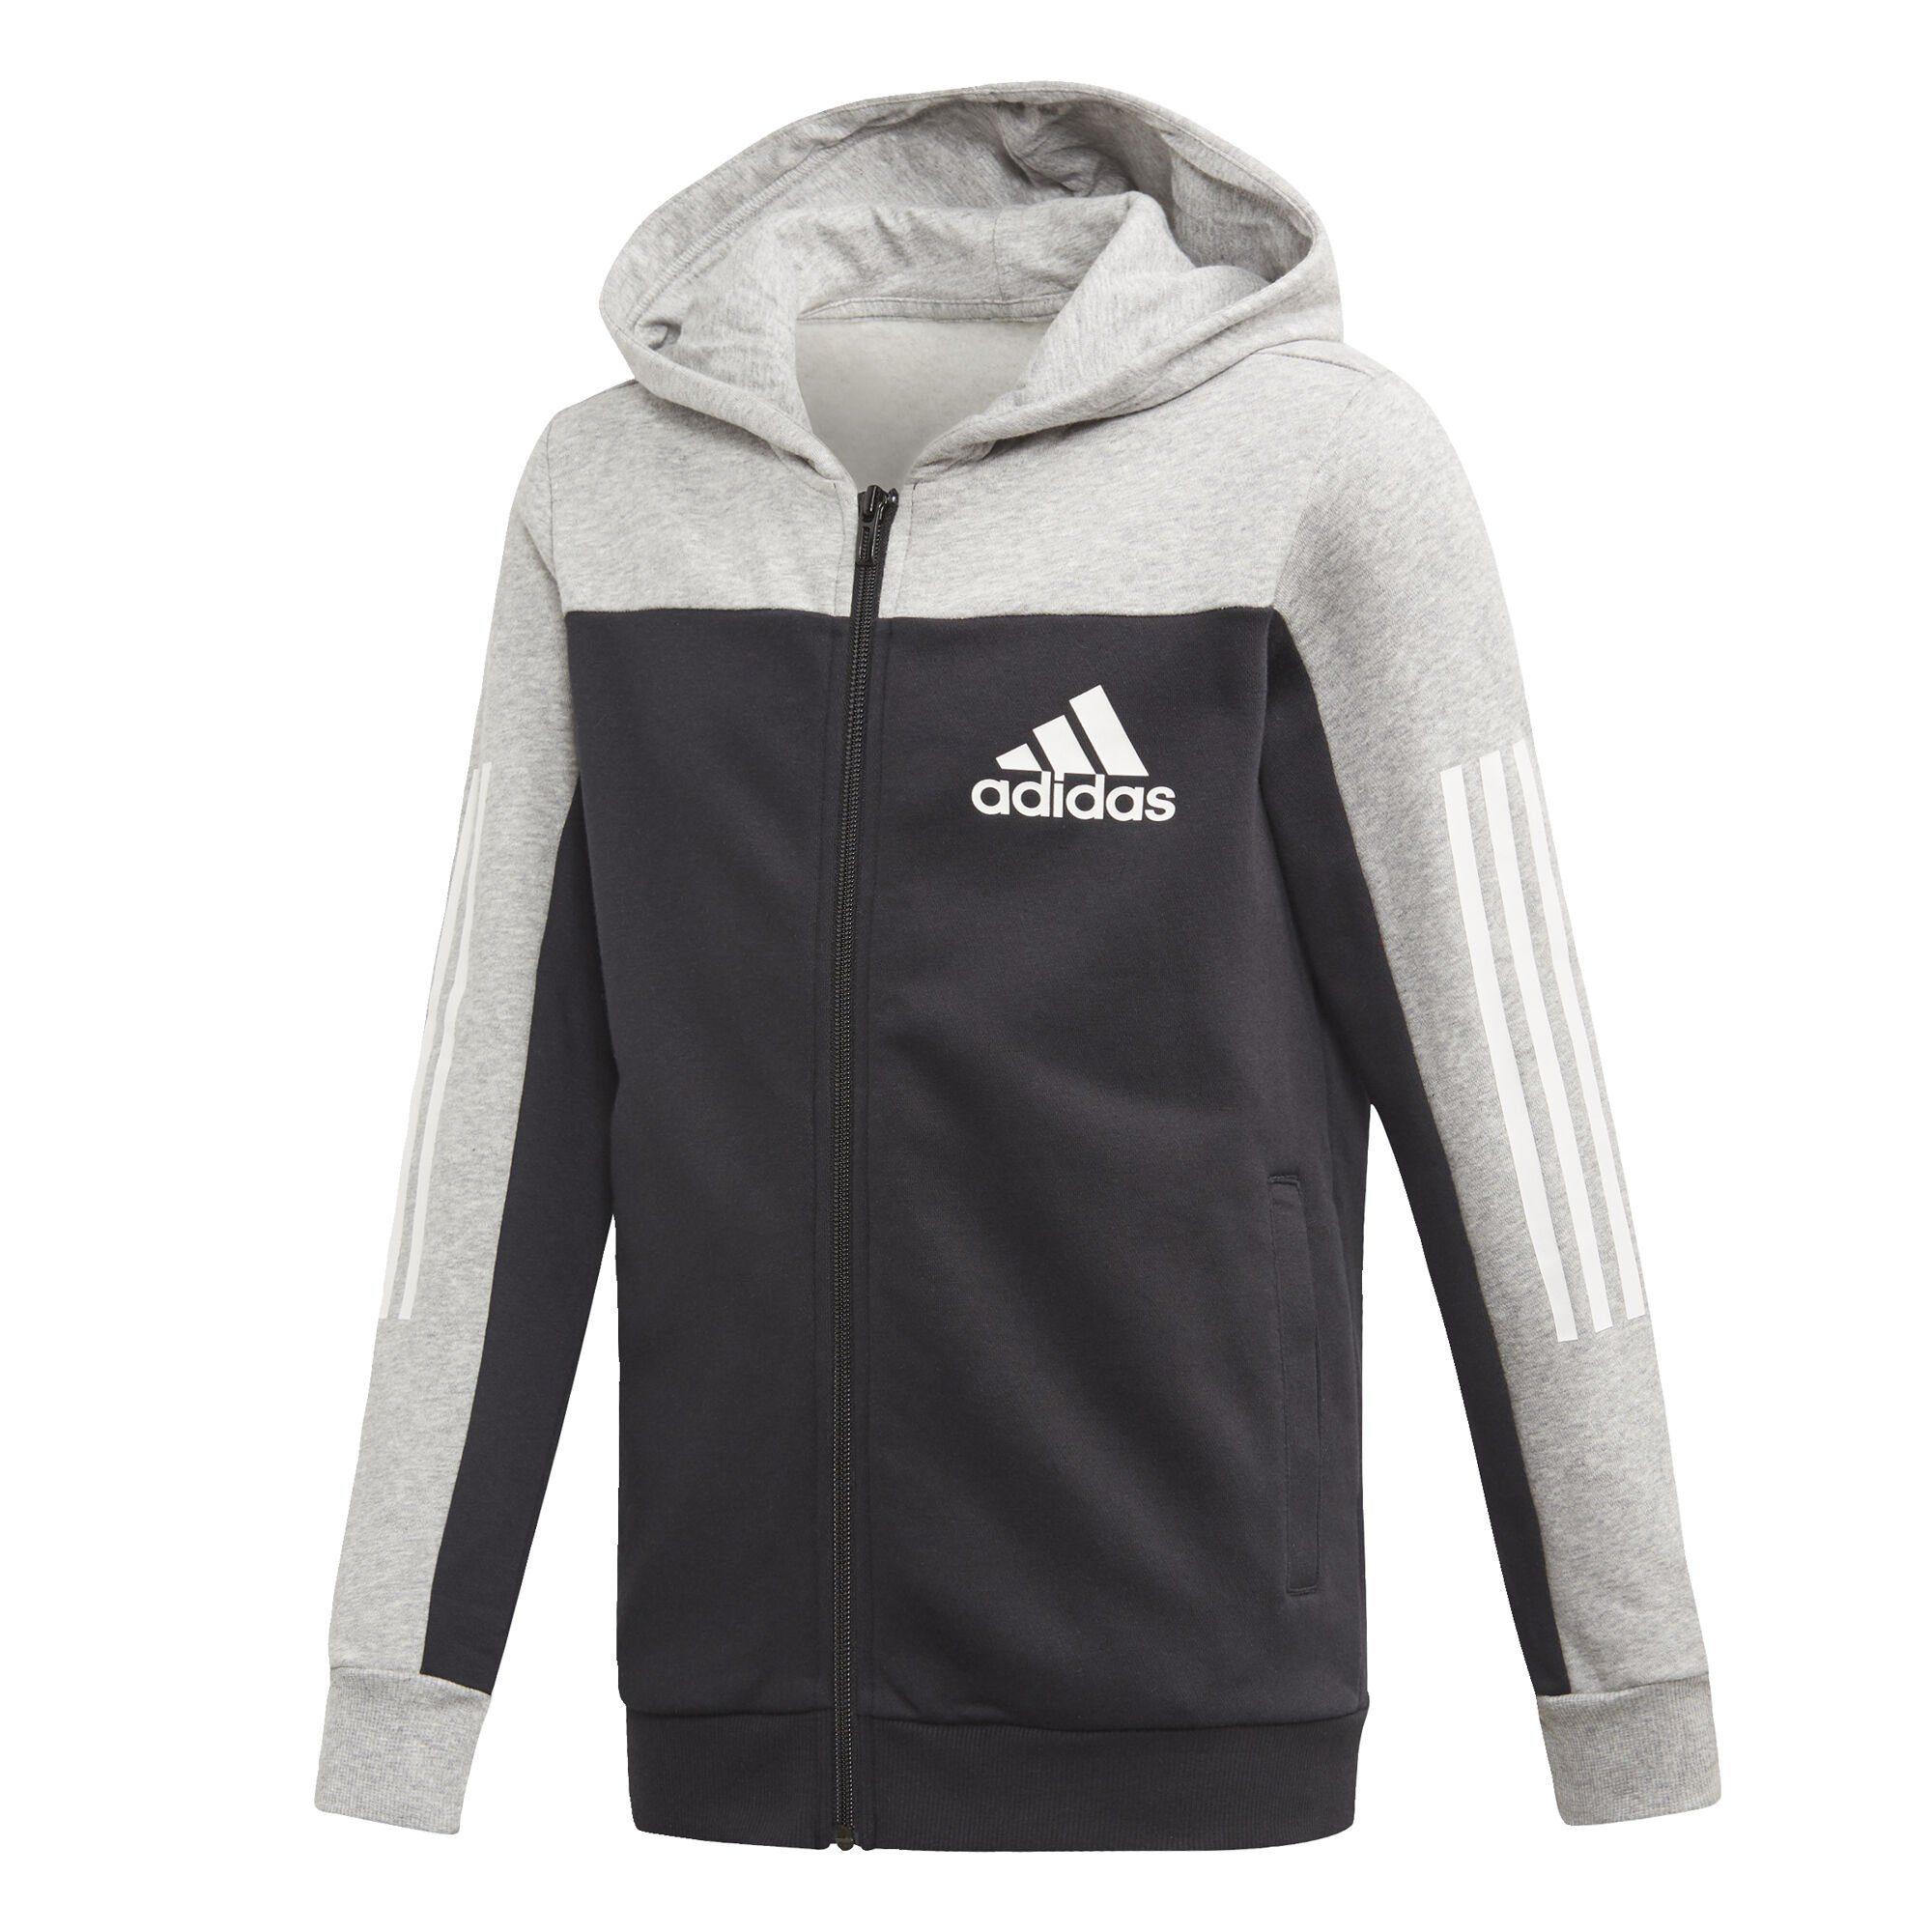 adidas Performance Sweatjacke »Sport ID Hoodie« Sport ID online kaufen | OTTO